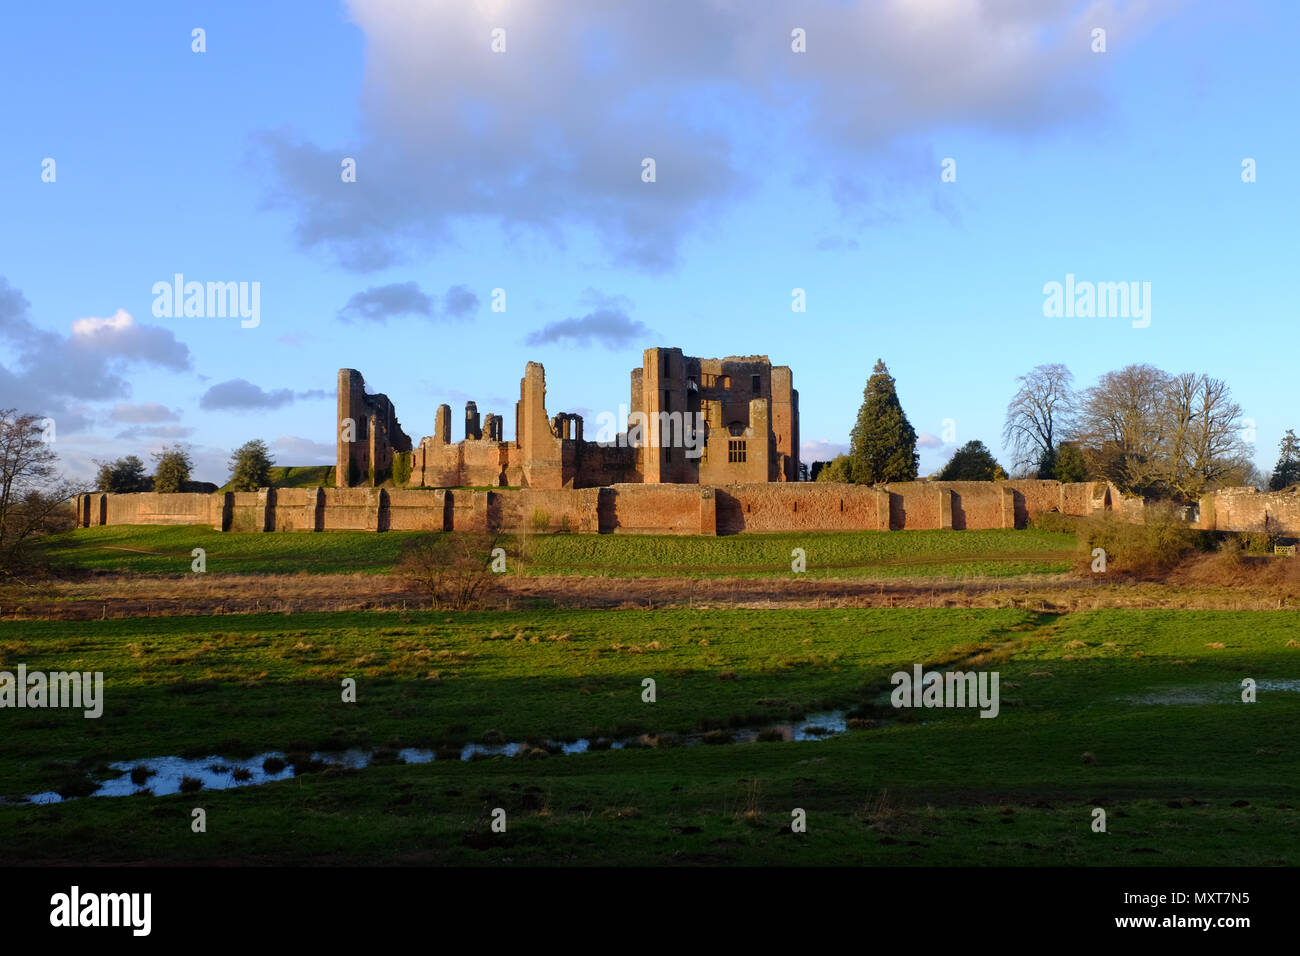 Kenilworth Castle, Warwickshire, England - Stock Image